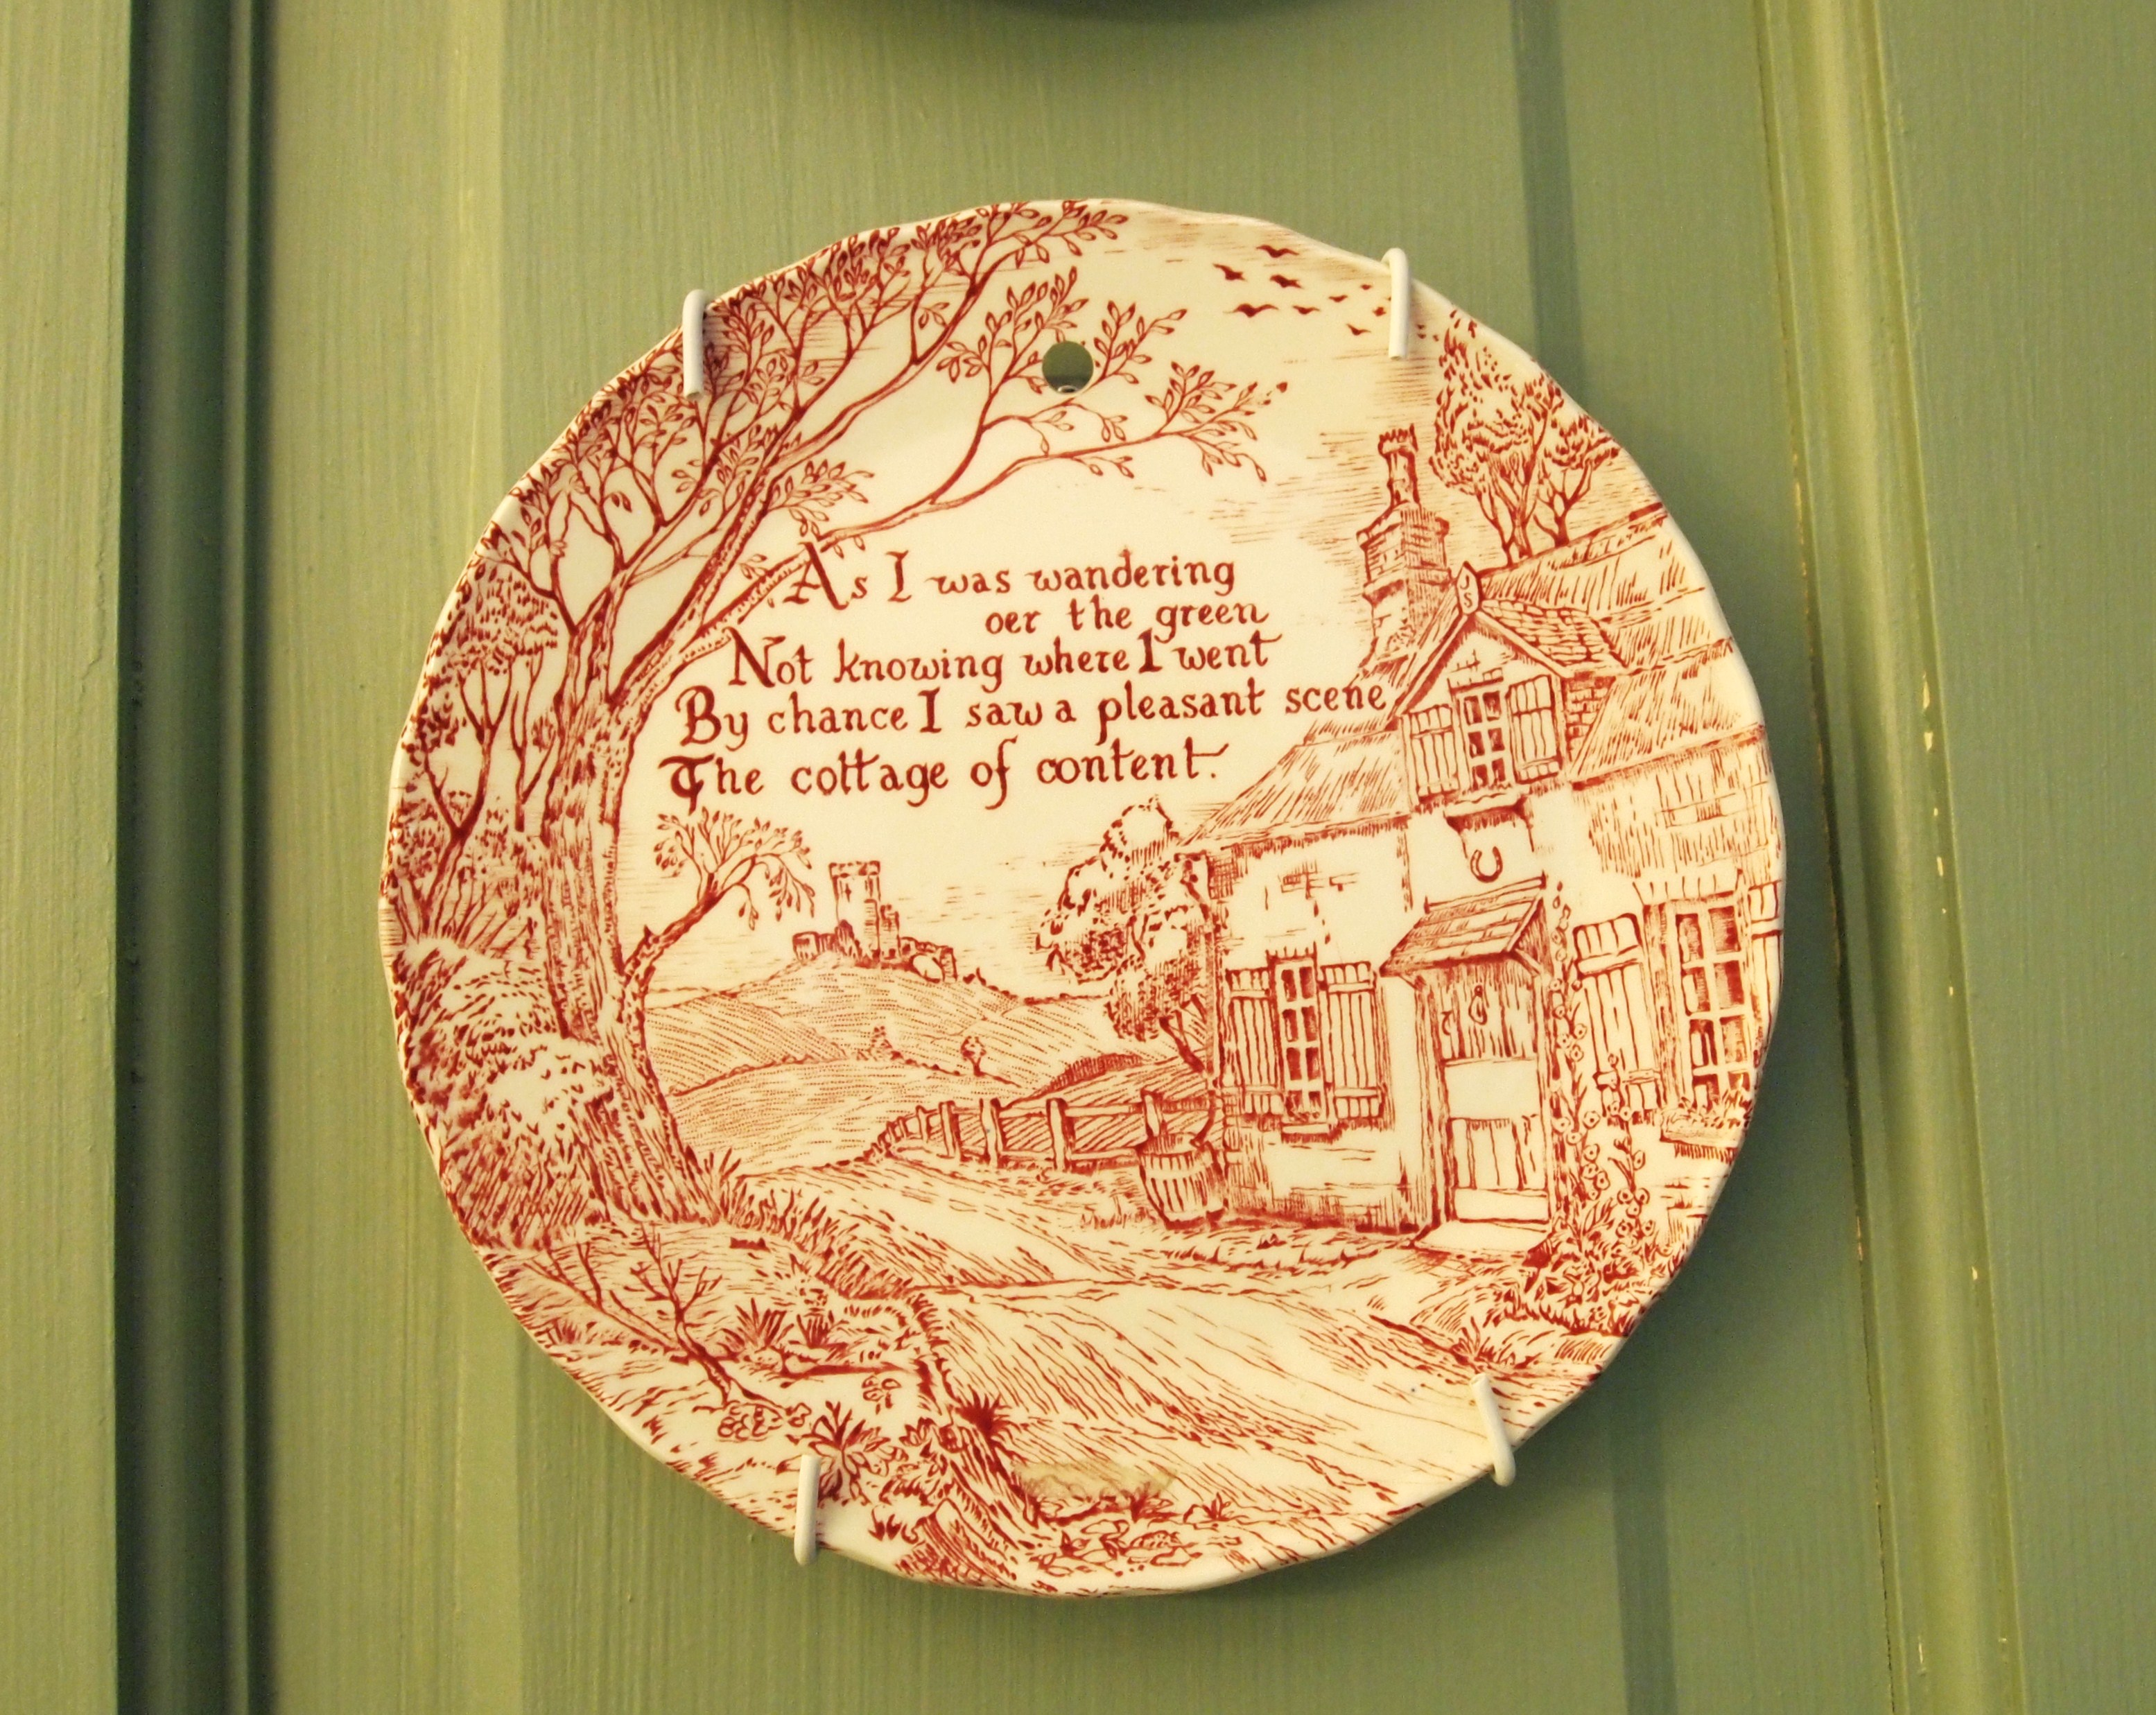 Contemporary Hampton Bay Decorative Wall Plate Ornament - Art & Wall ...